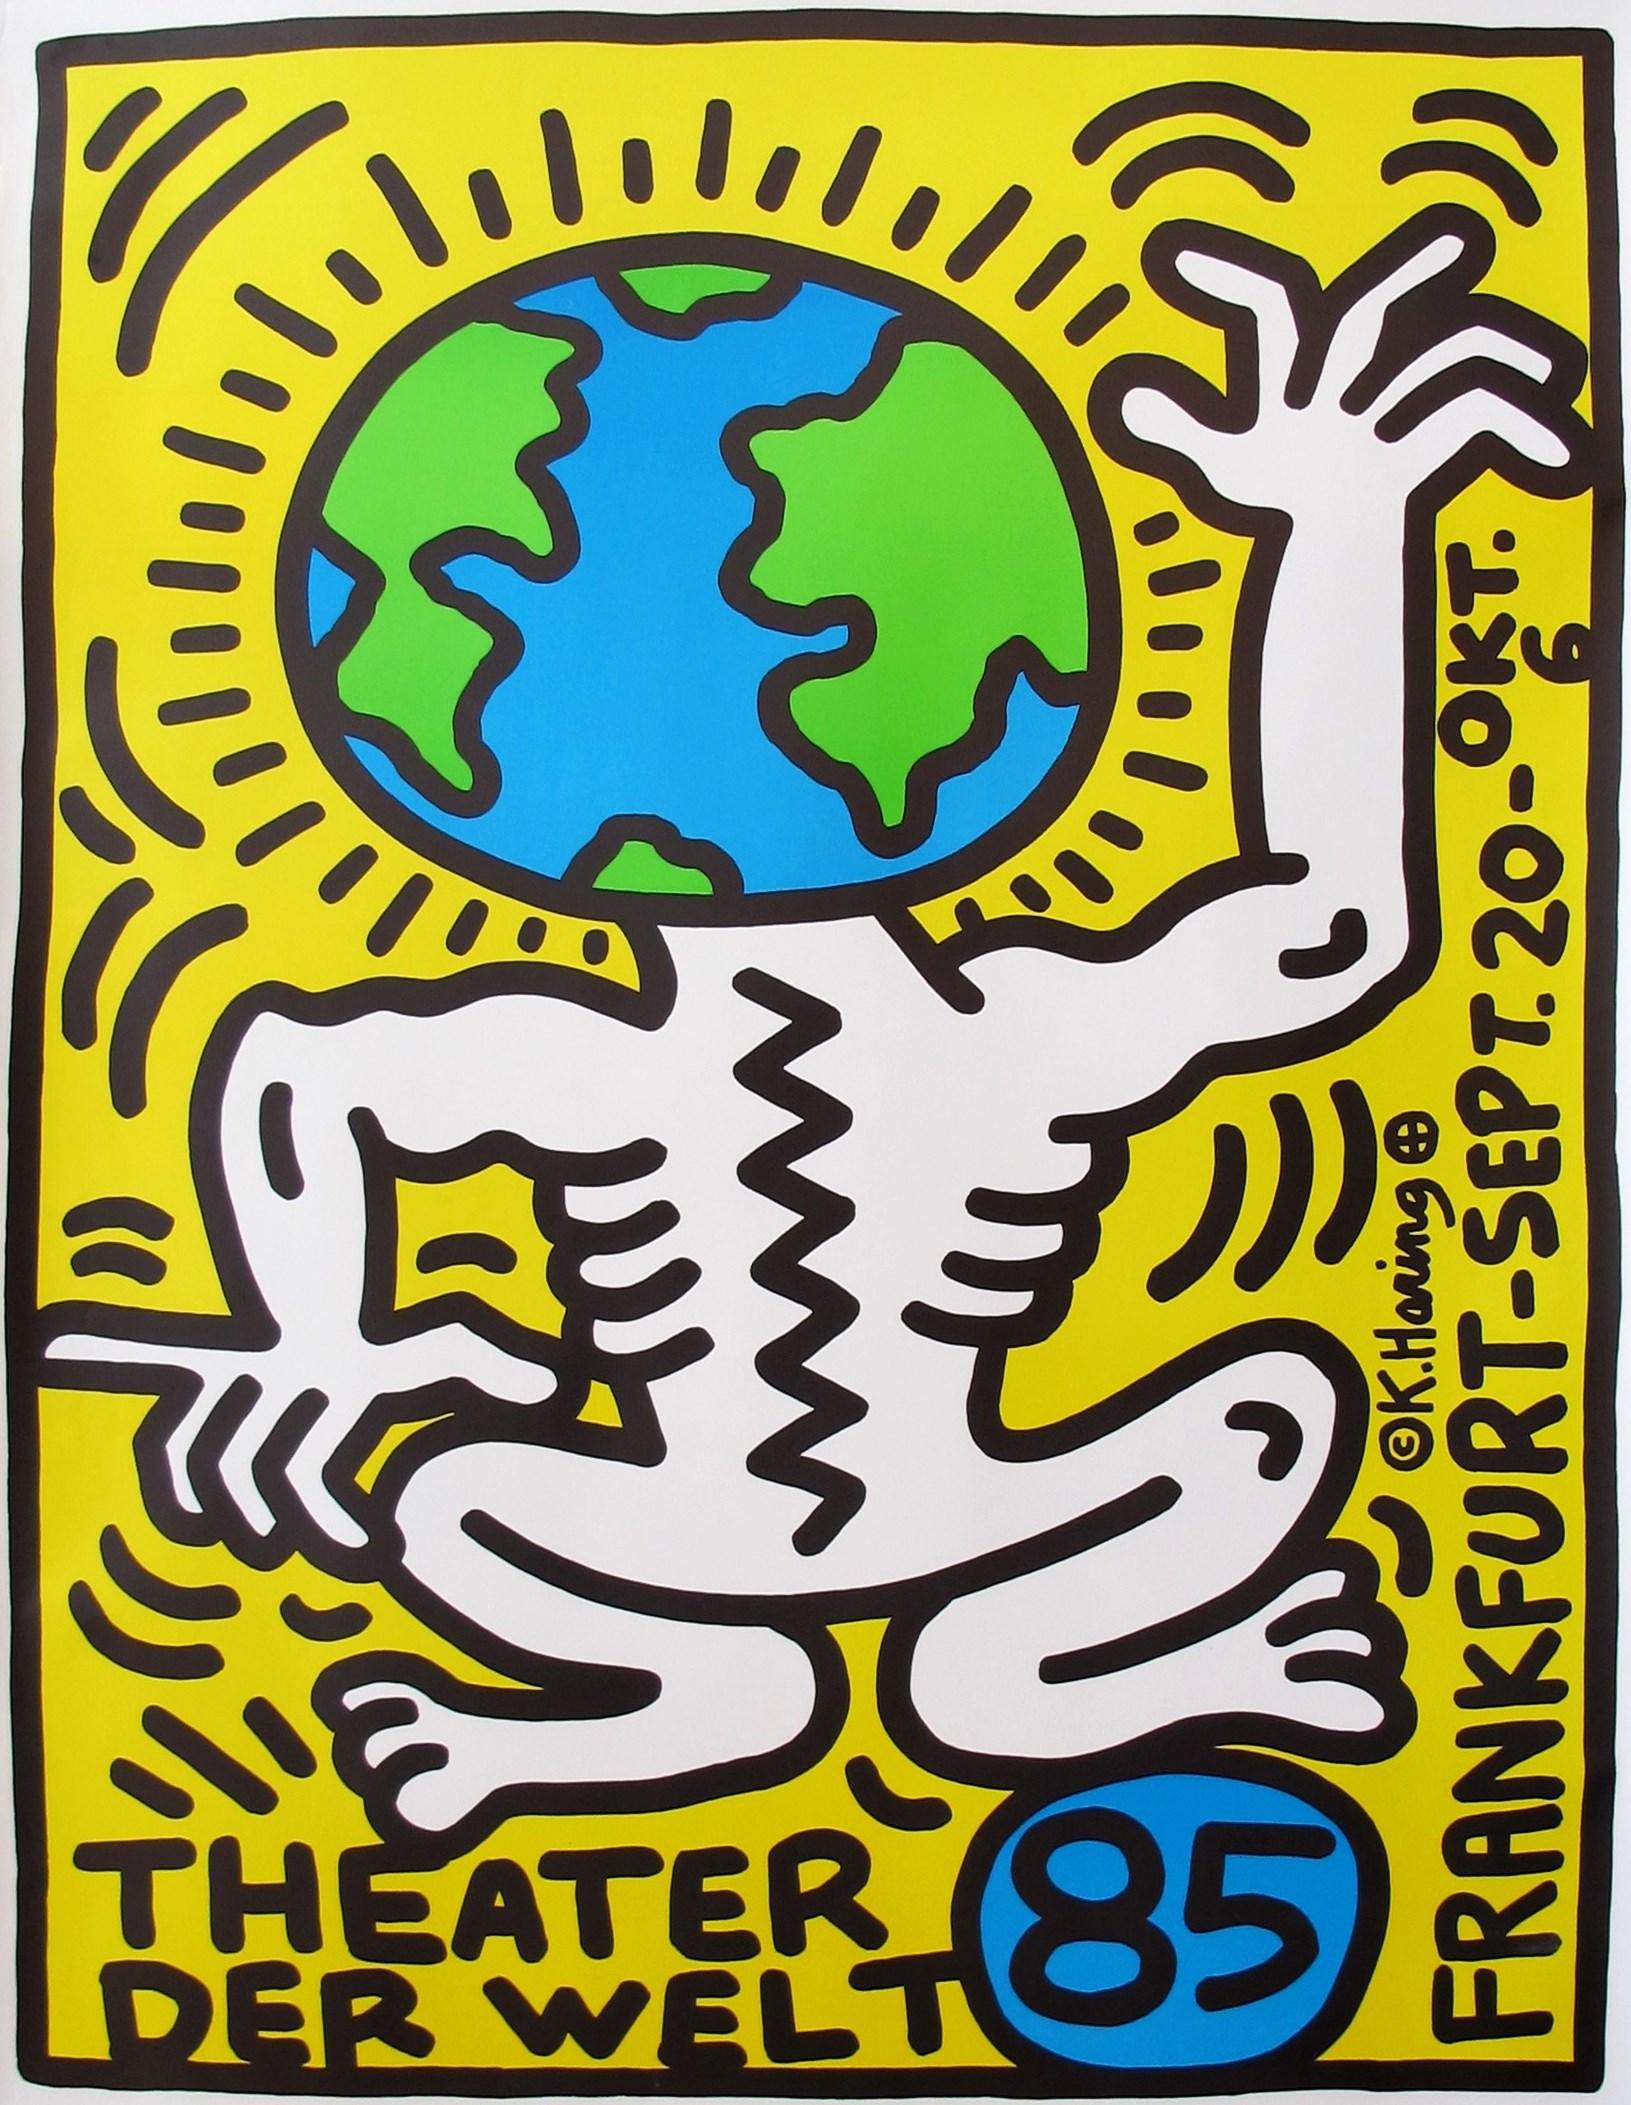 Graves international art keith haring for Graphic design frankfurt